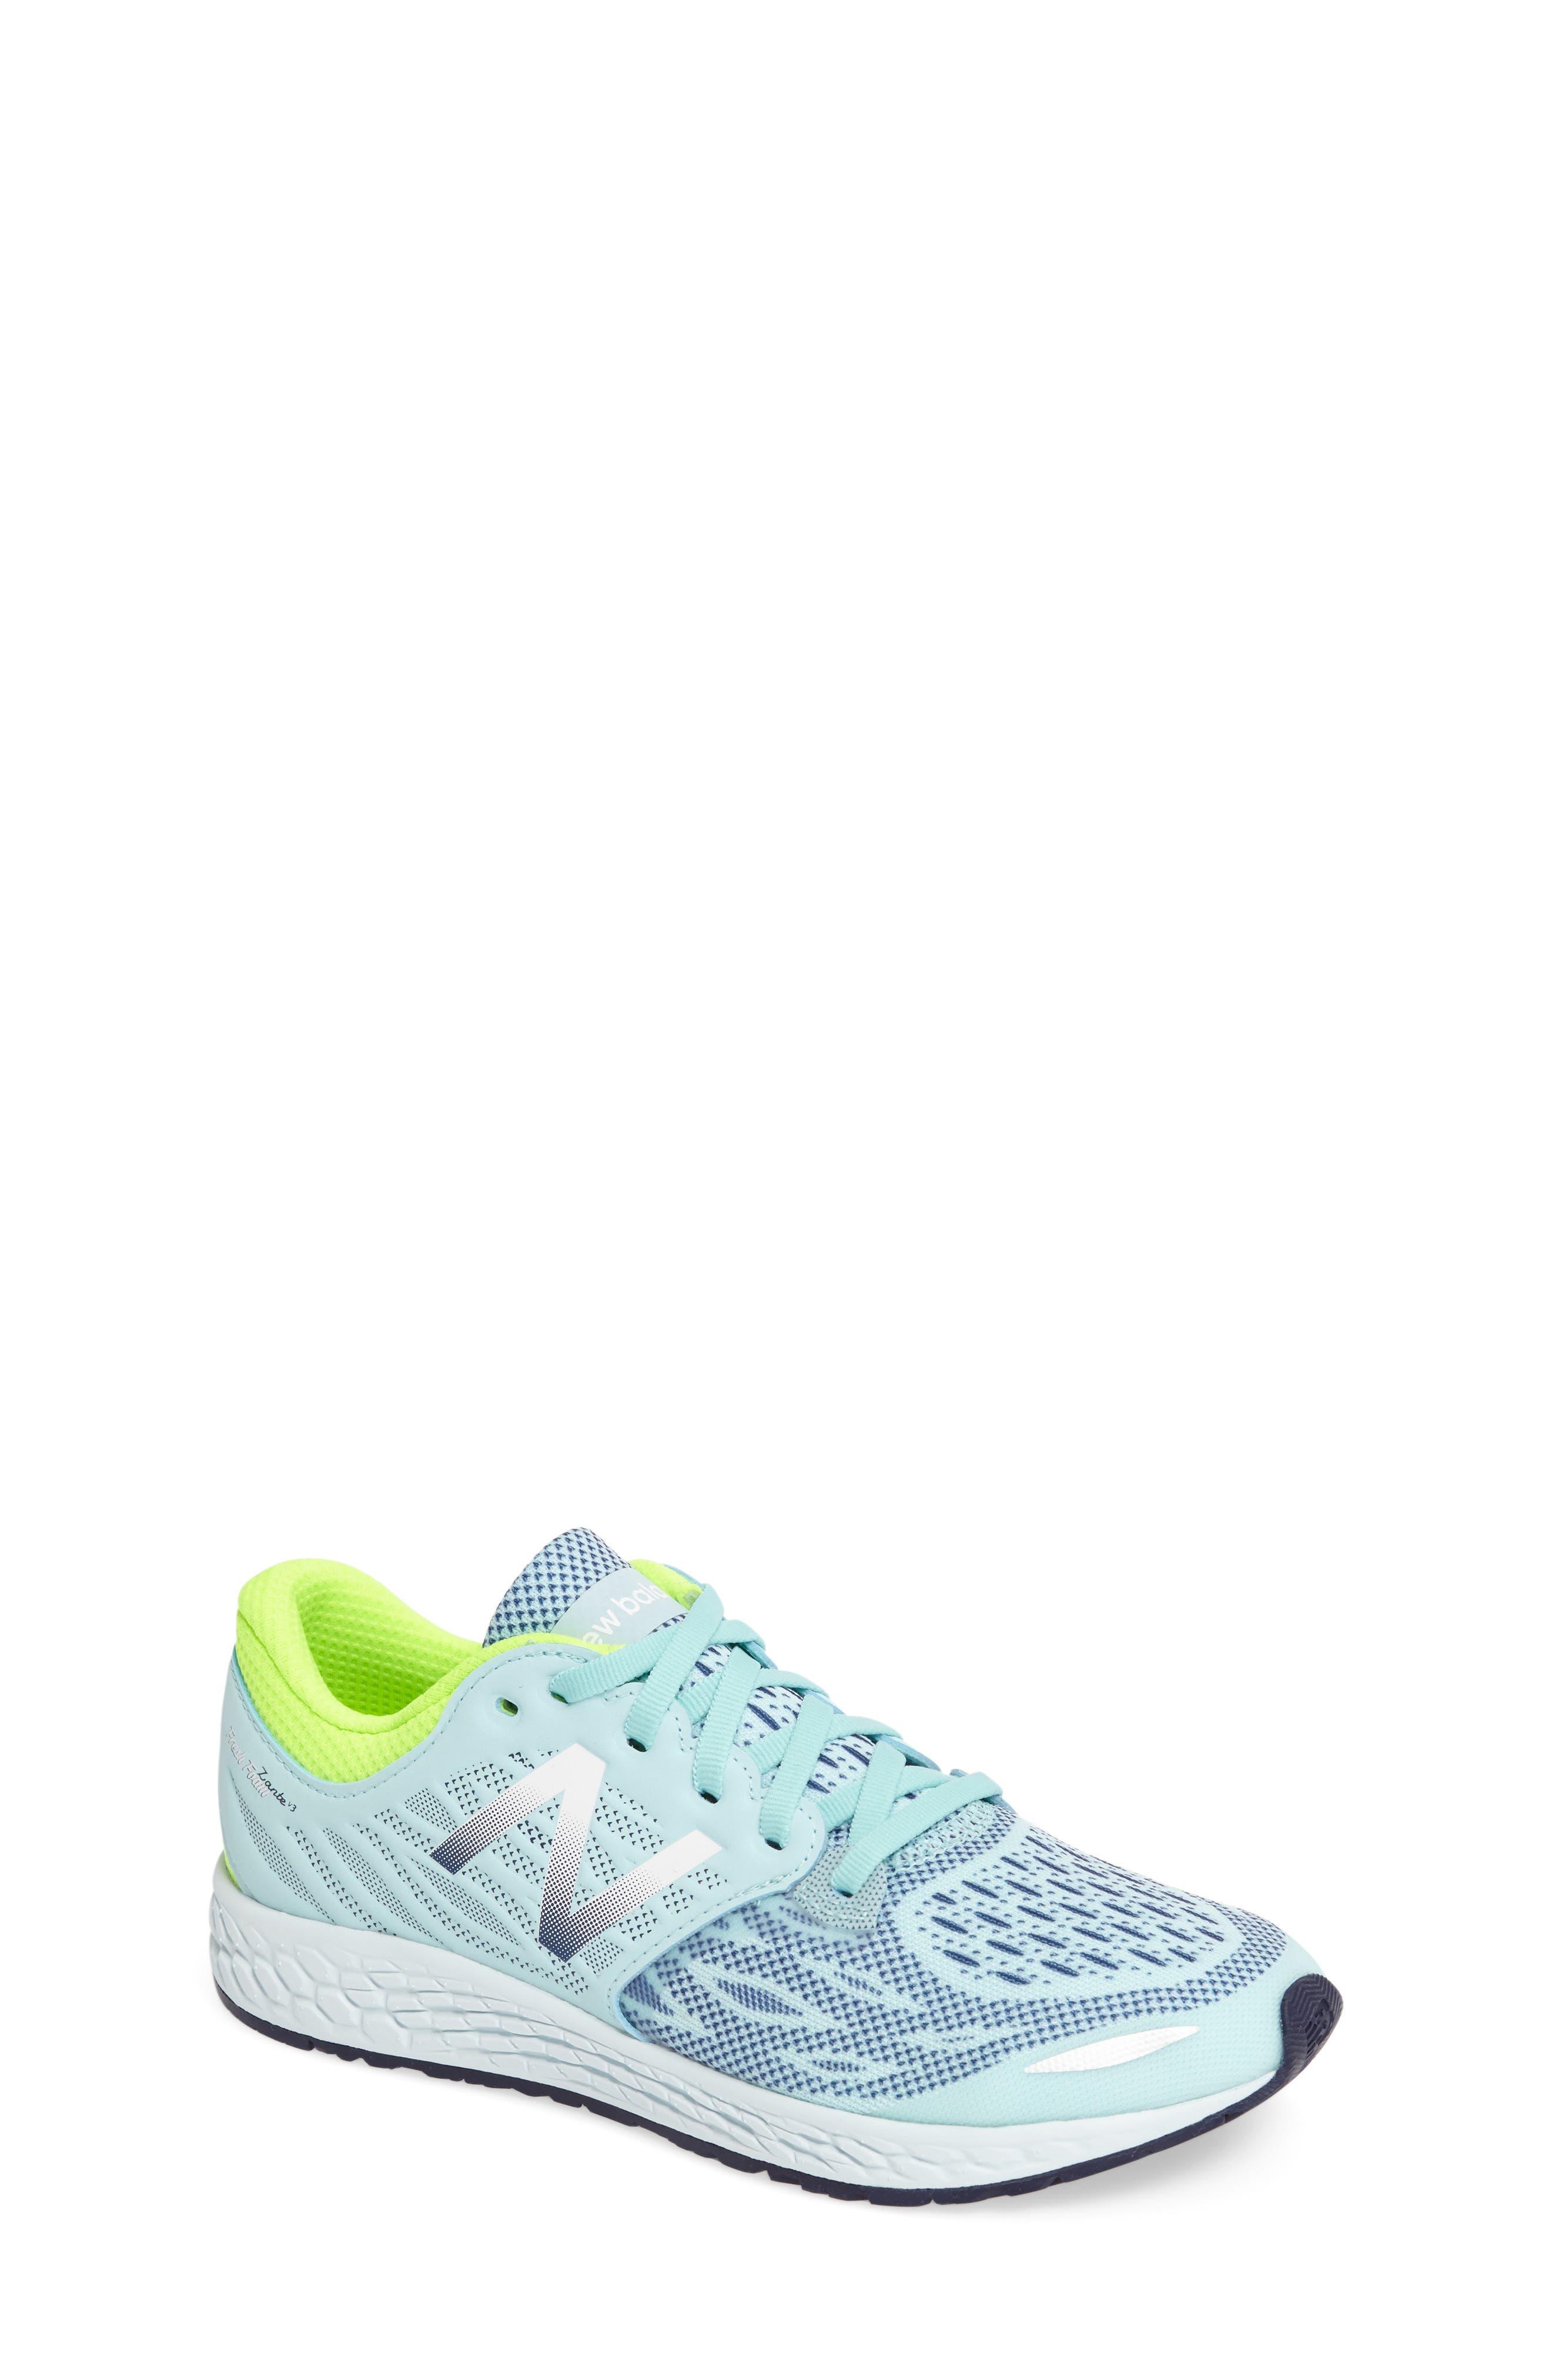 Fresh Foam Sneaker,                         Main,                         color, Teal/Green